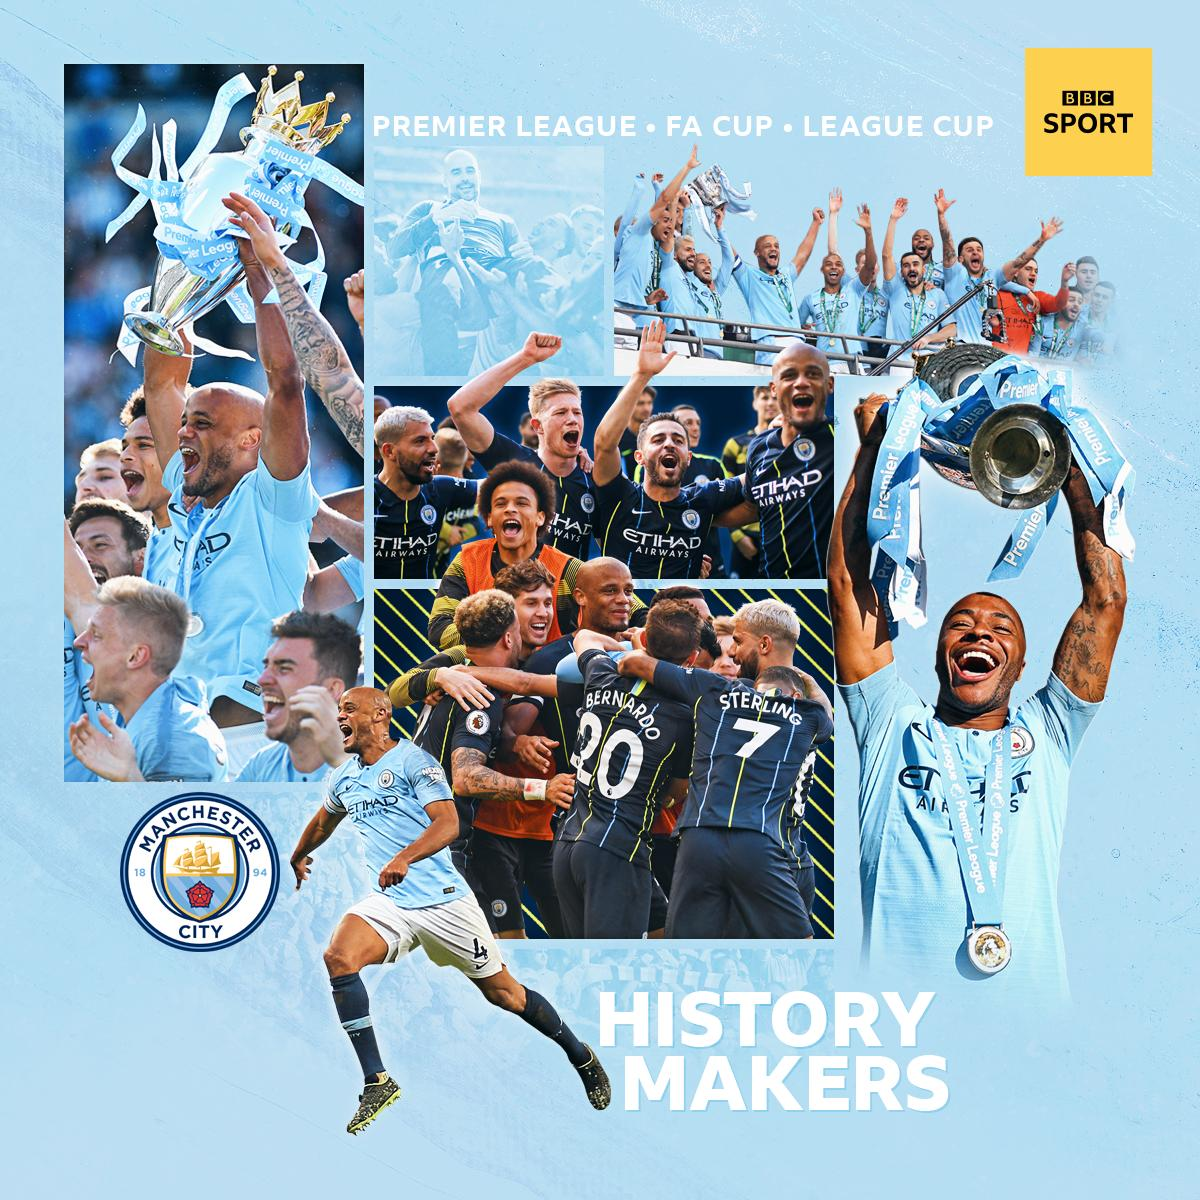 Graphic made for BBC Sport to celebrate Man City's domestic treble  #mancity #mcfc #kompany #sterling #pepguardiola